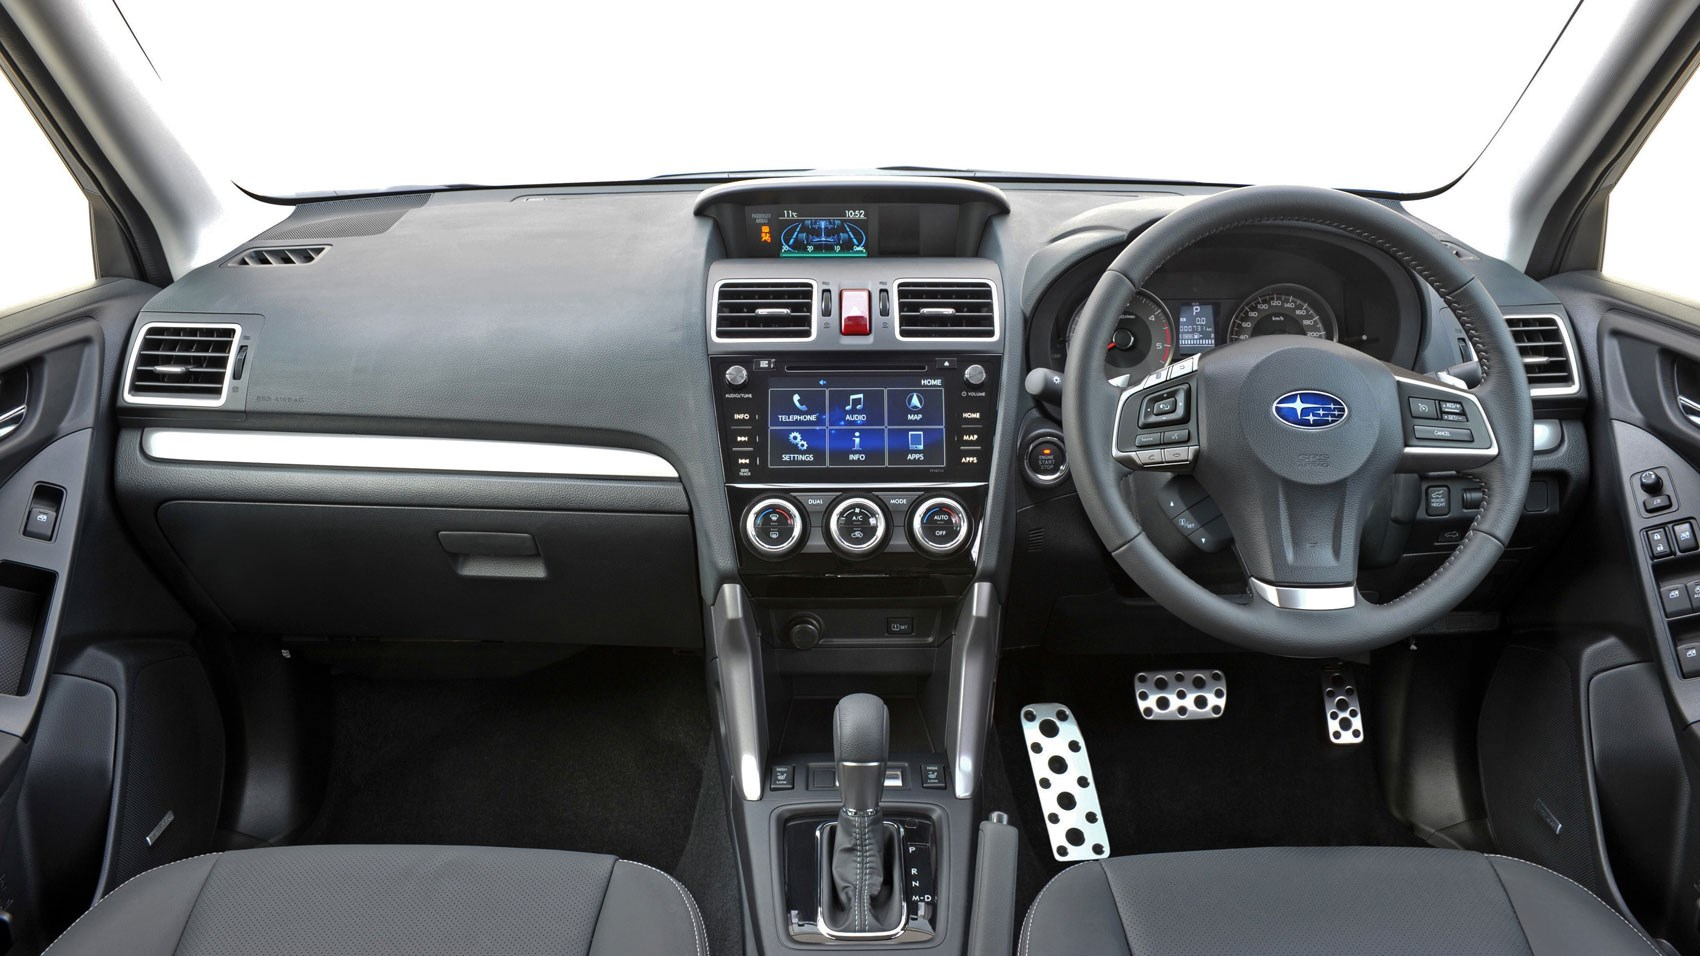 Subaru Forester 2 0d Lineartronic Xc Premium 2015 Review Car Magazine